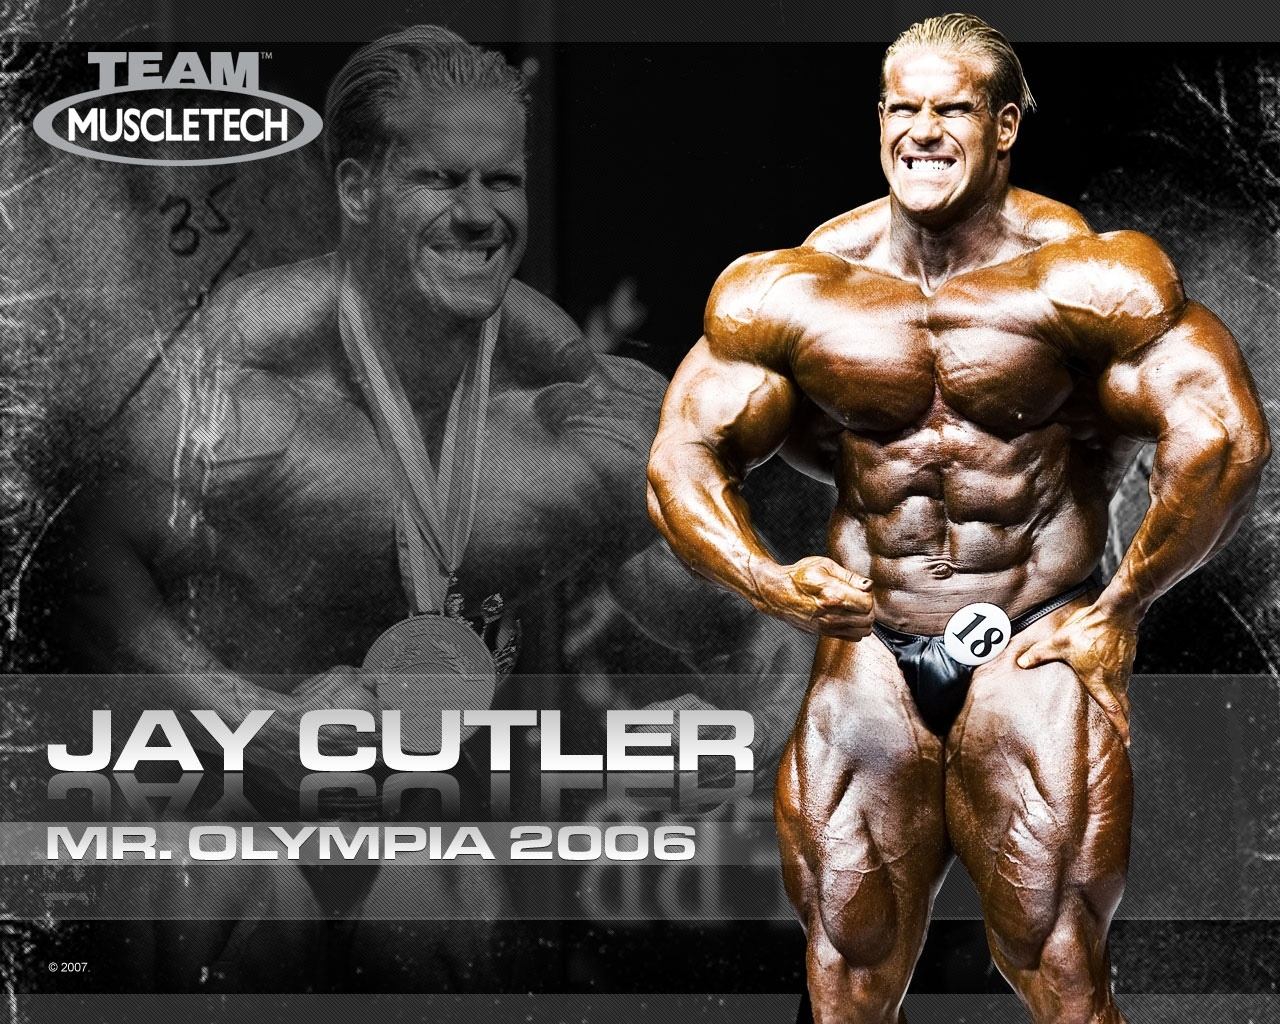 Human Body Jay Cutler Bodybuilder Jay 1280x1024